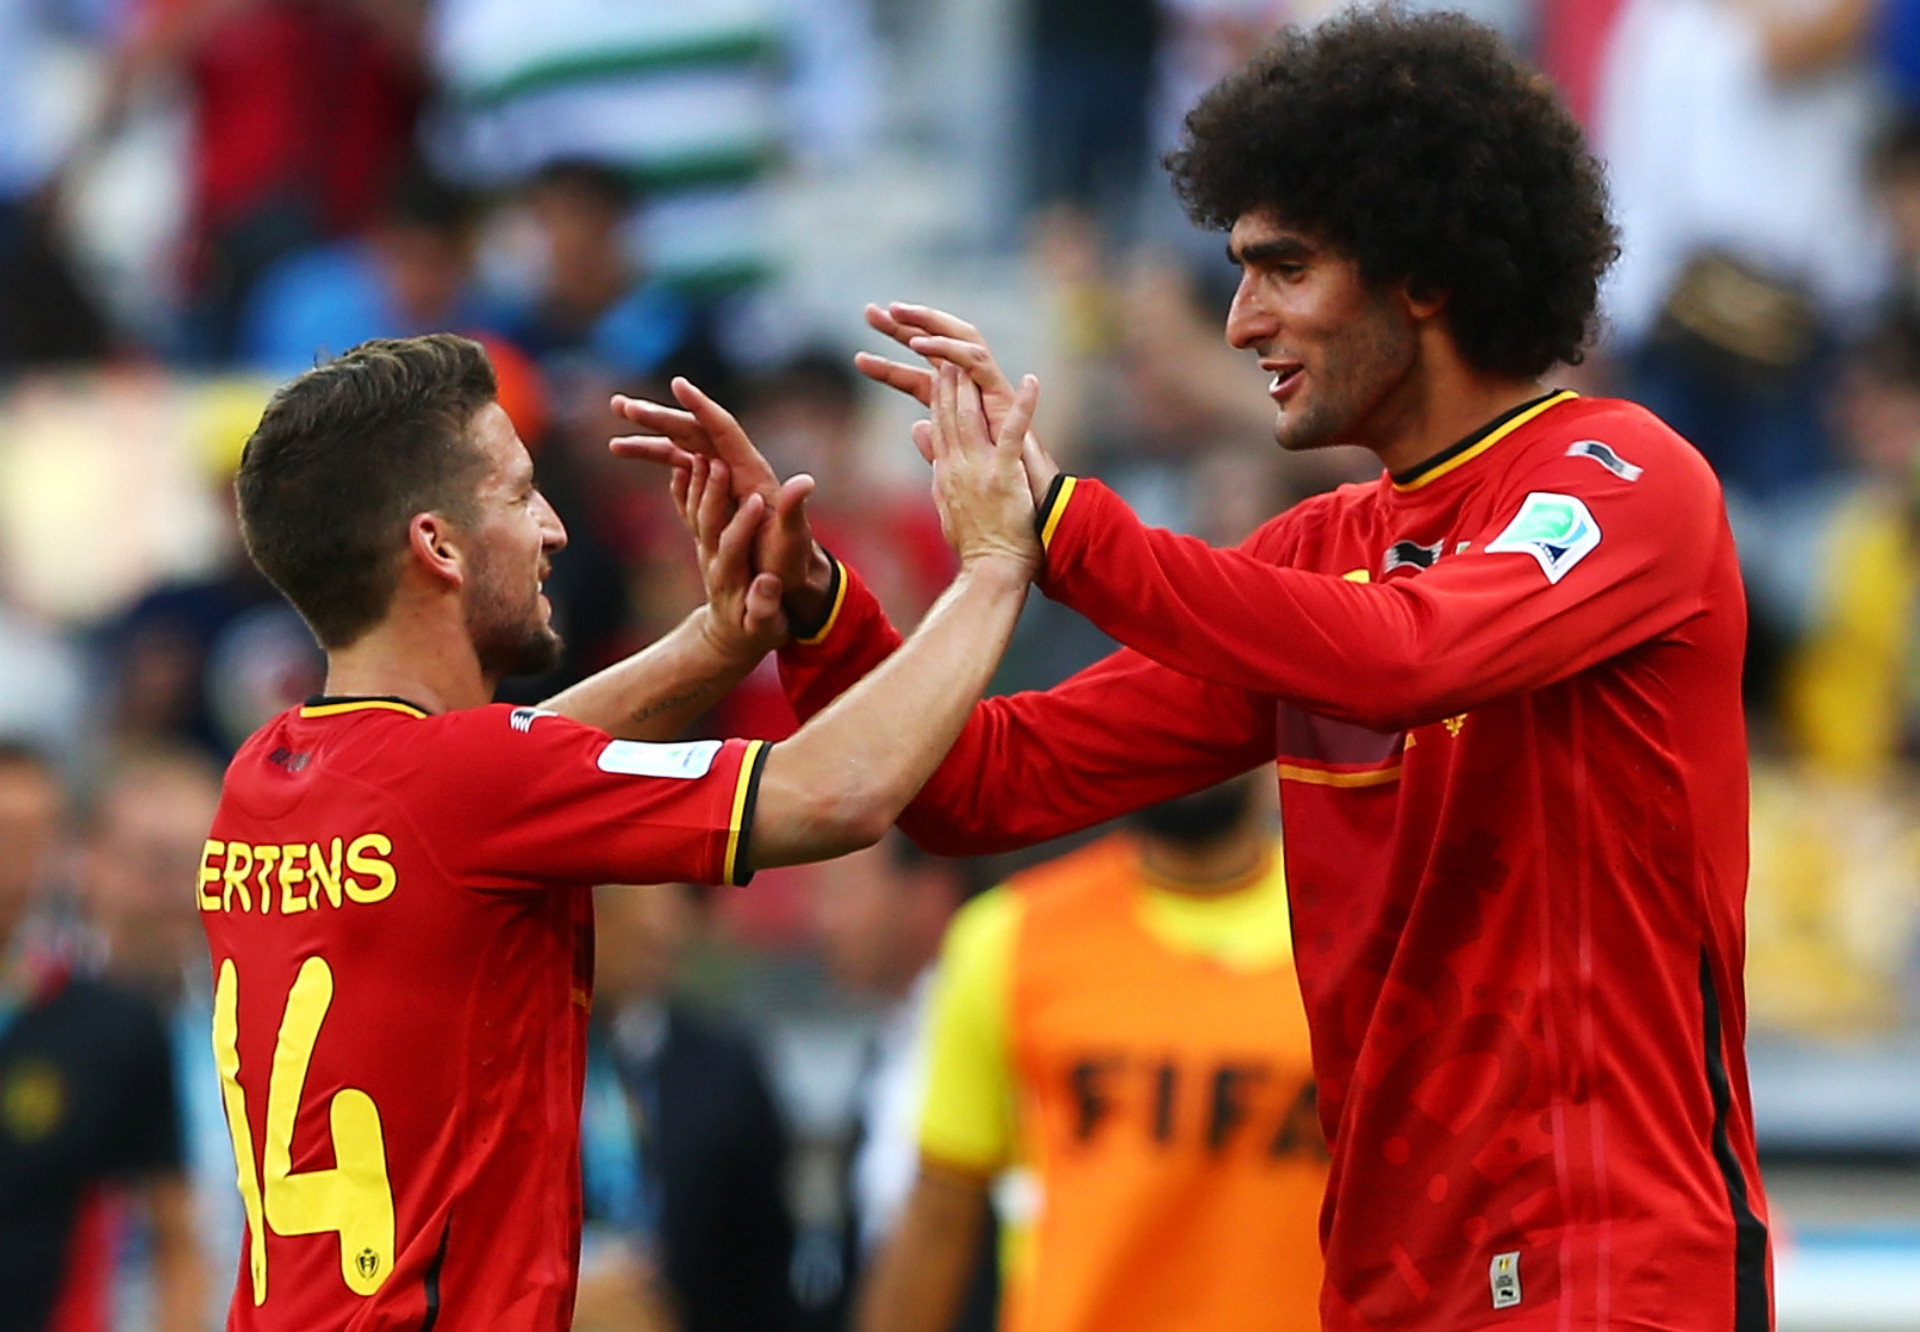 Match Belgique Russie en direct et streaming live